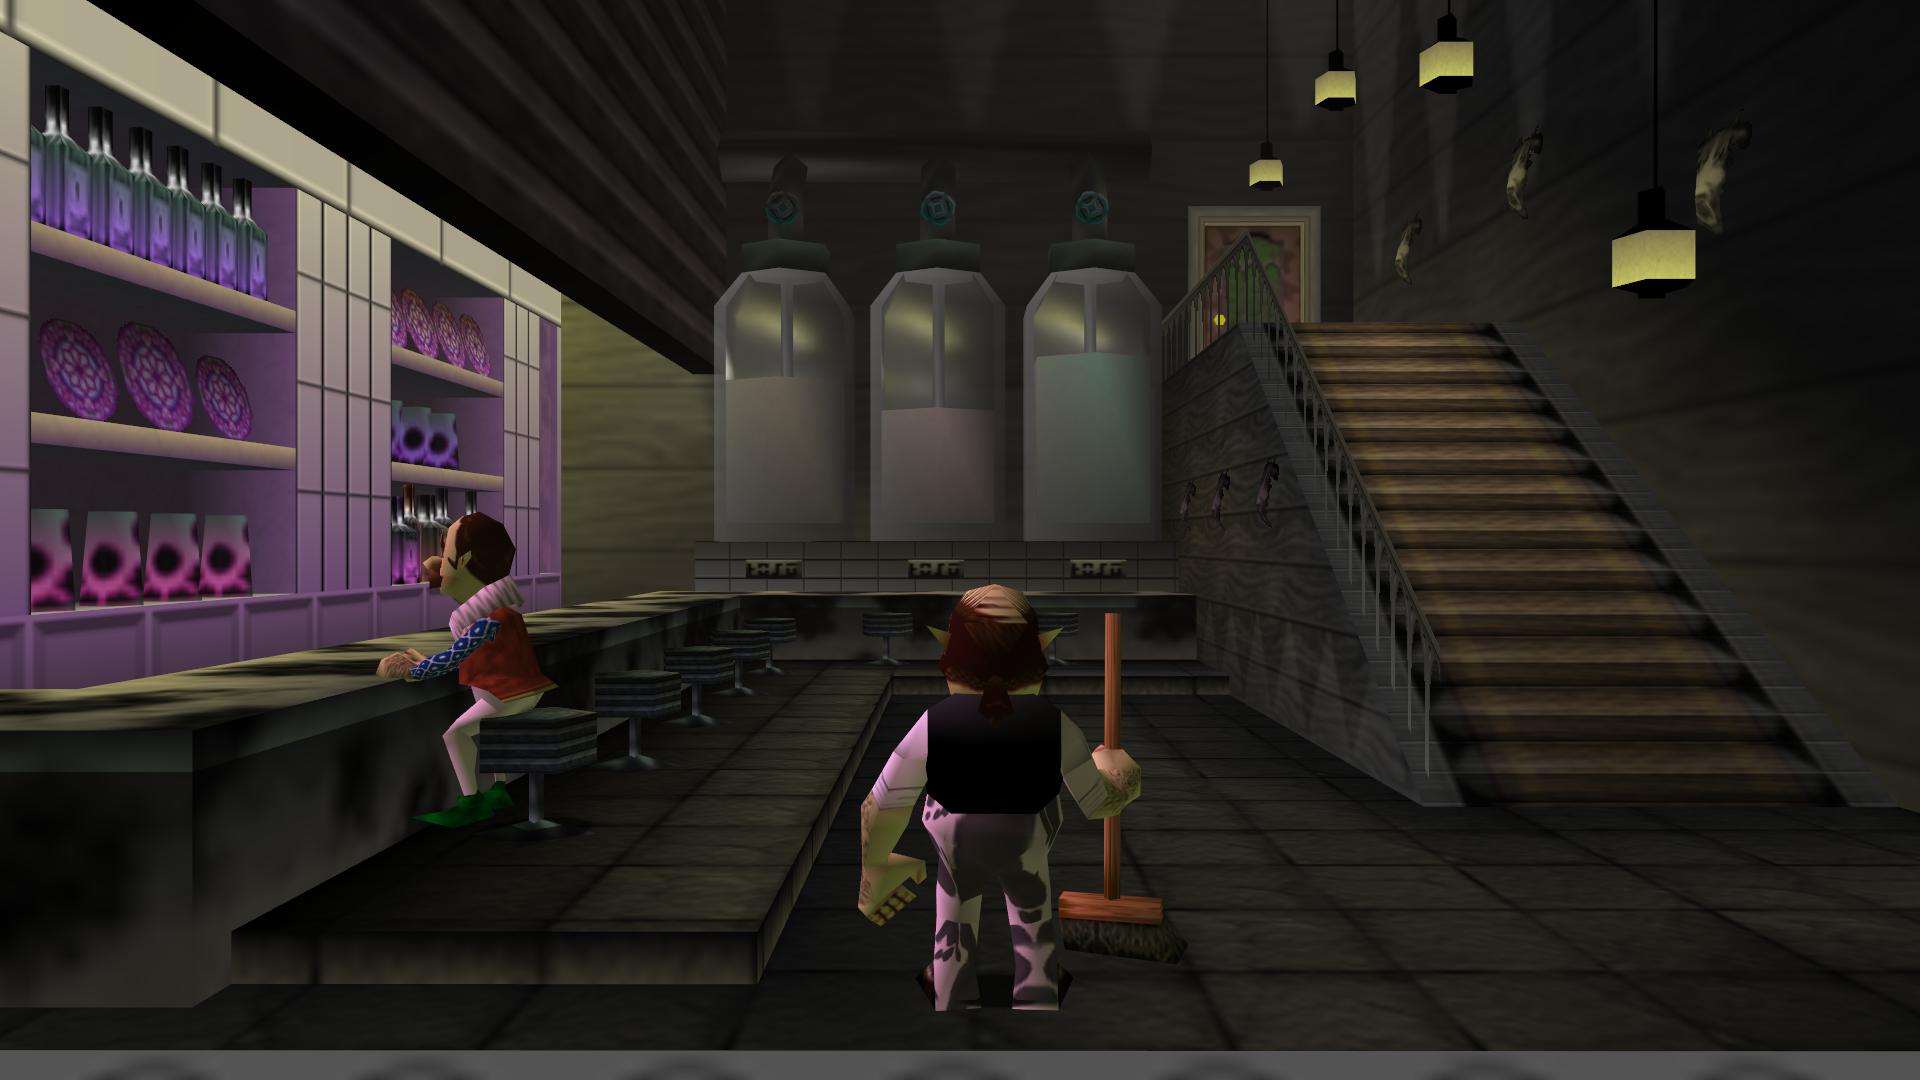 Image Milk Bar Majoras Maskpng Zeldapedia Fandom Powered